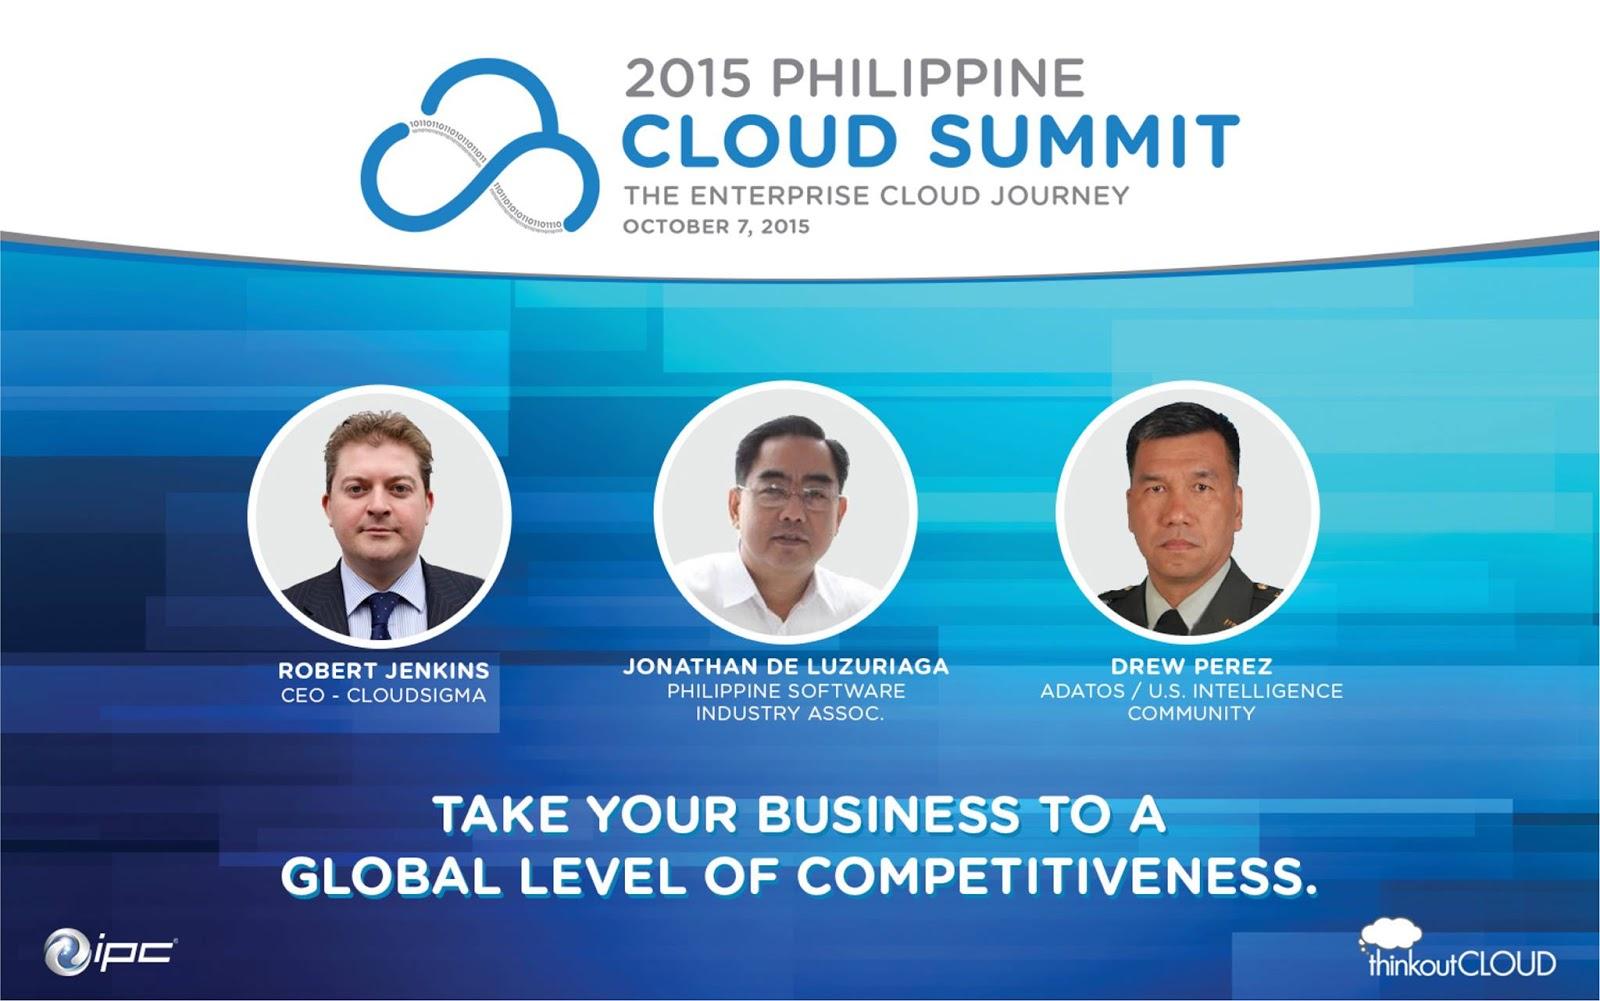 IPC's Cloud Summit